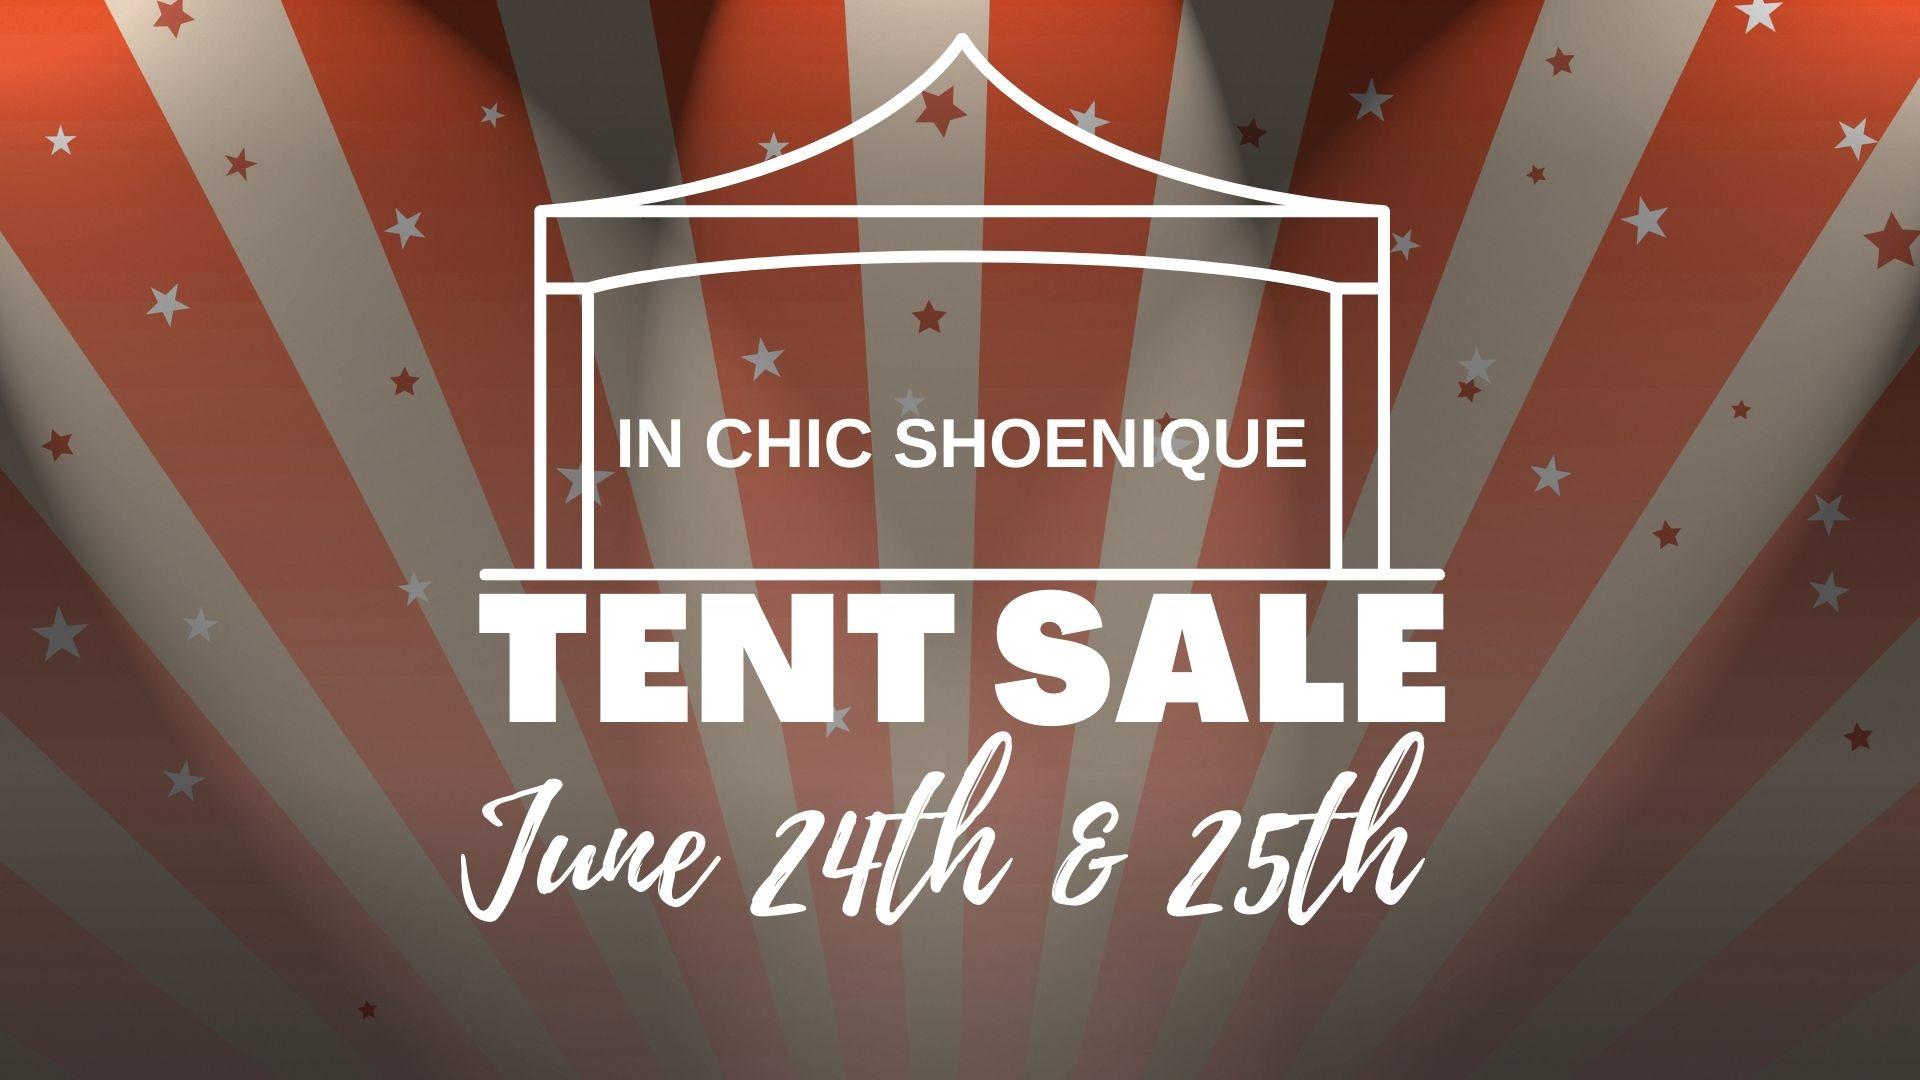 In Chic Shoenique Tent Sale